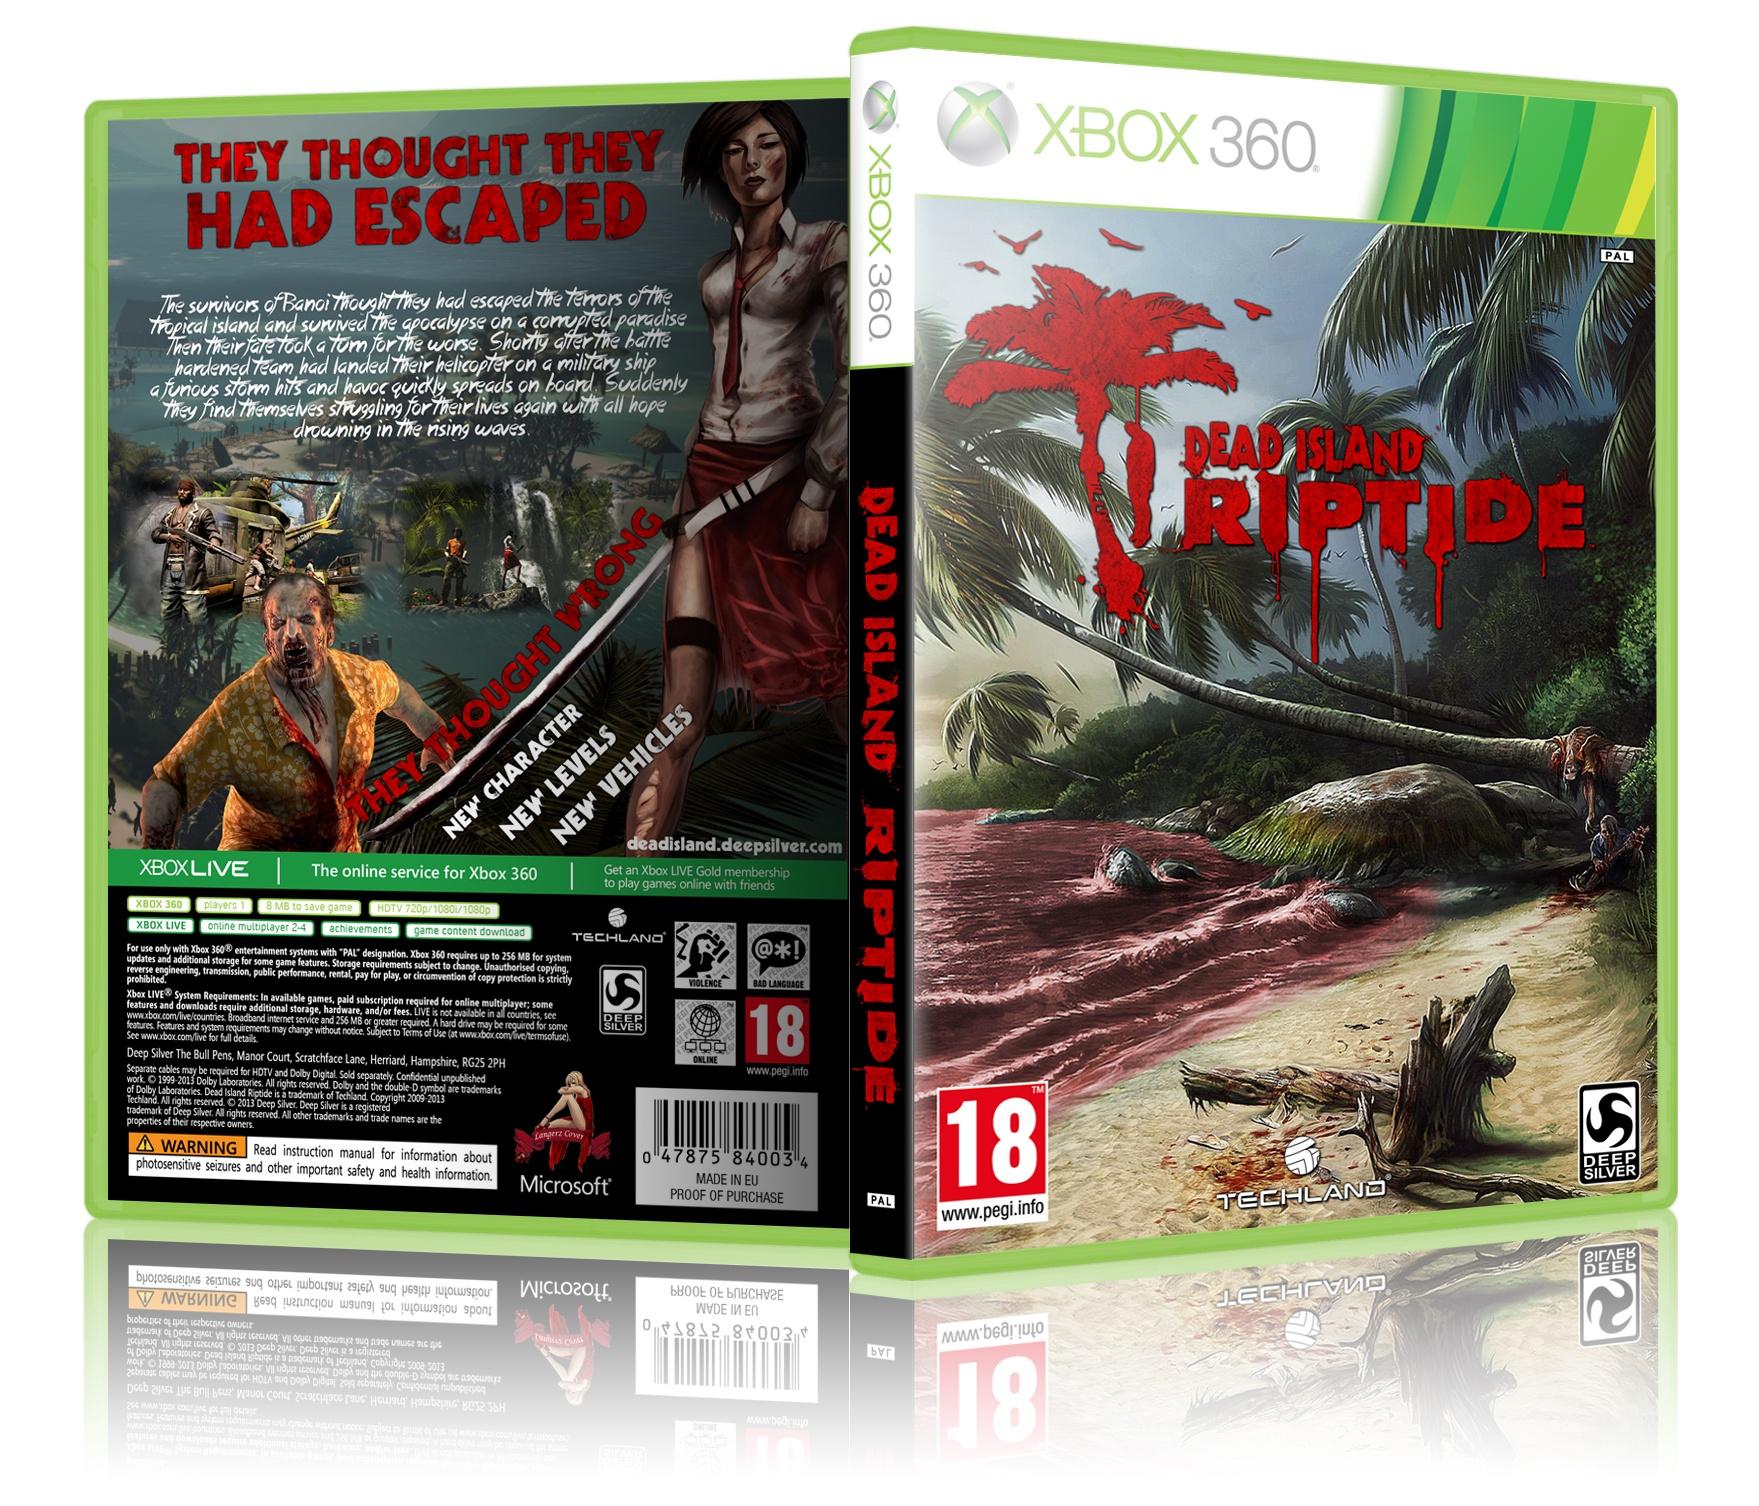 Dead Island Riptide Xbox 360 Box Art Cover By Langerz